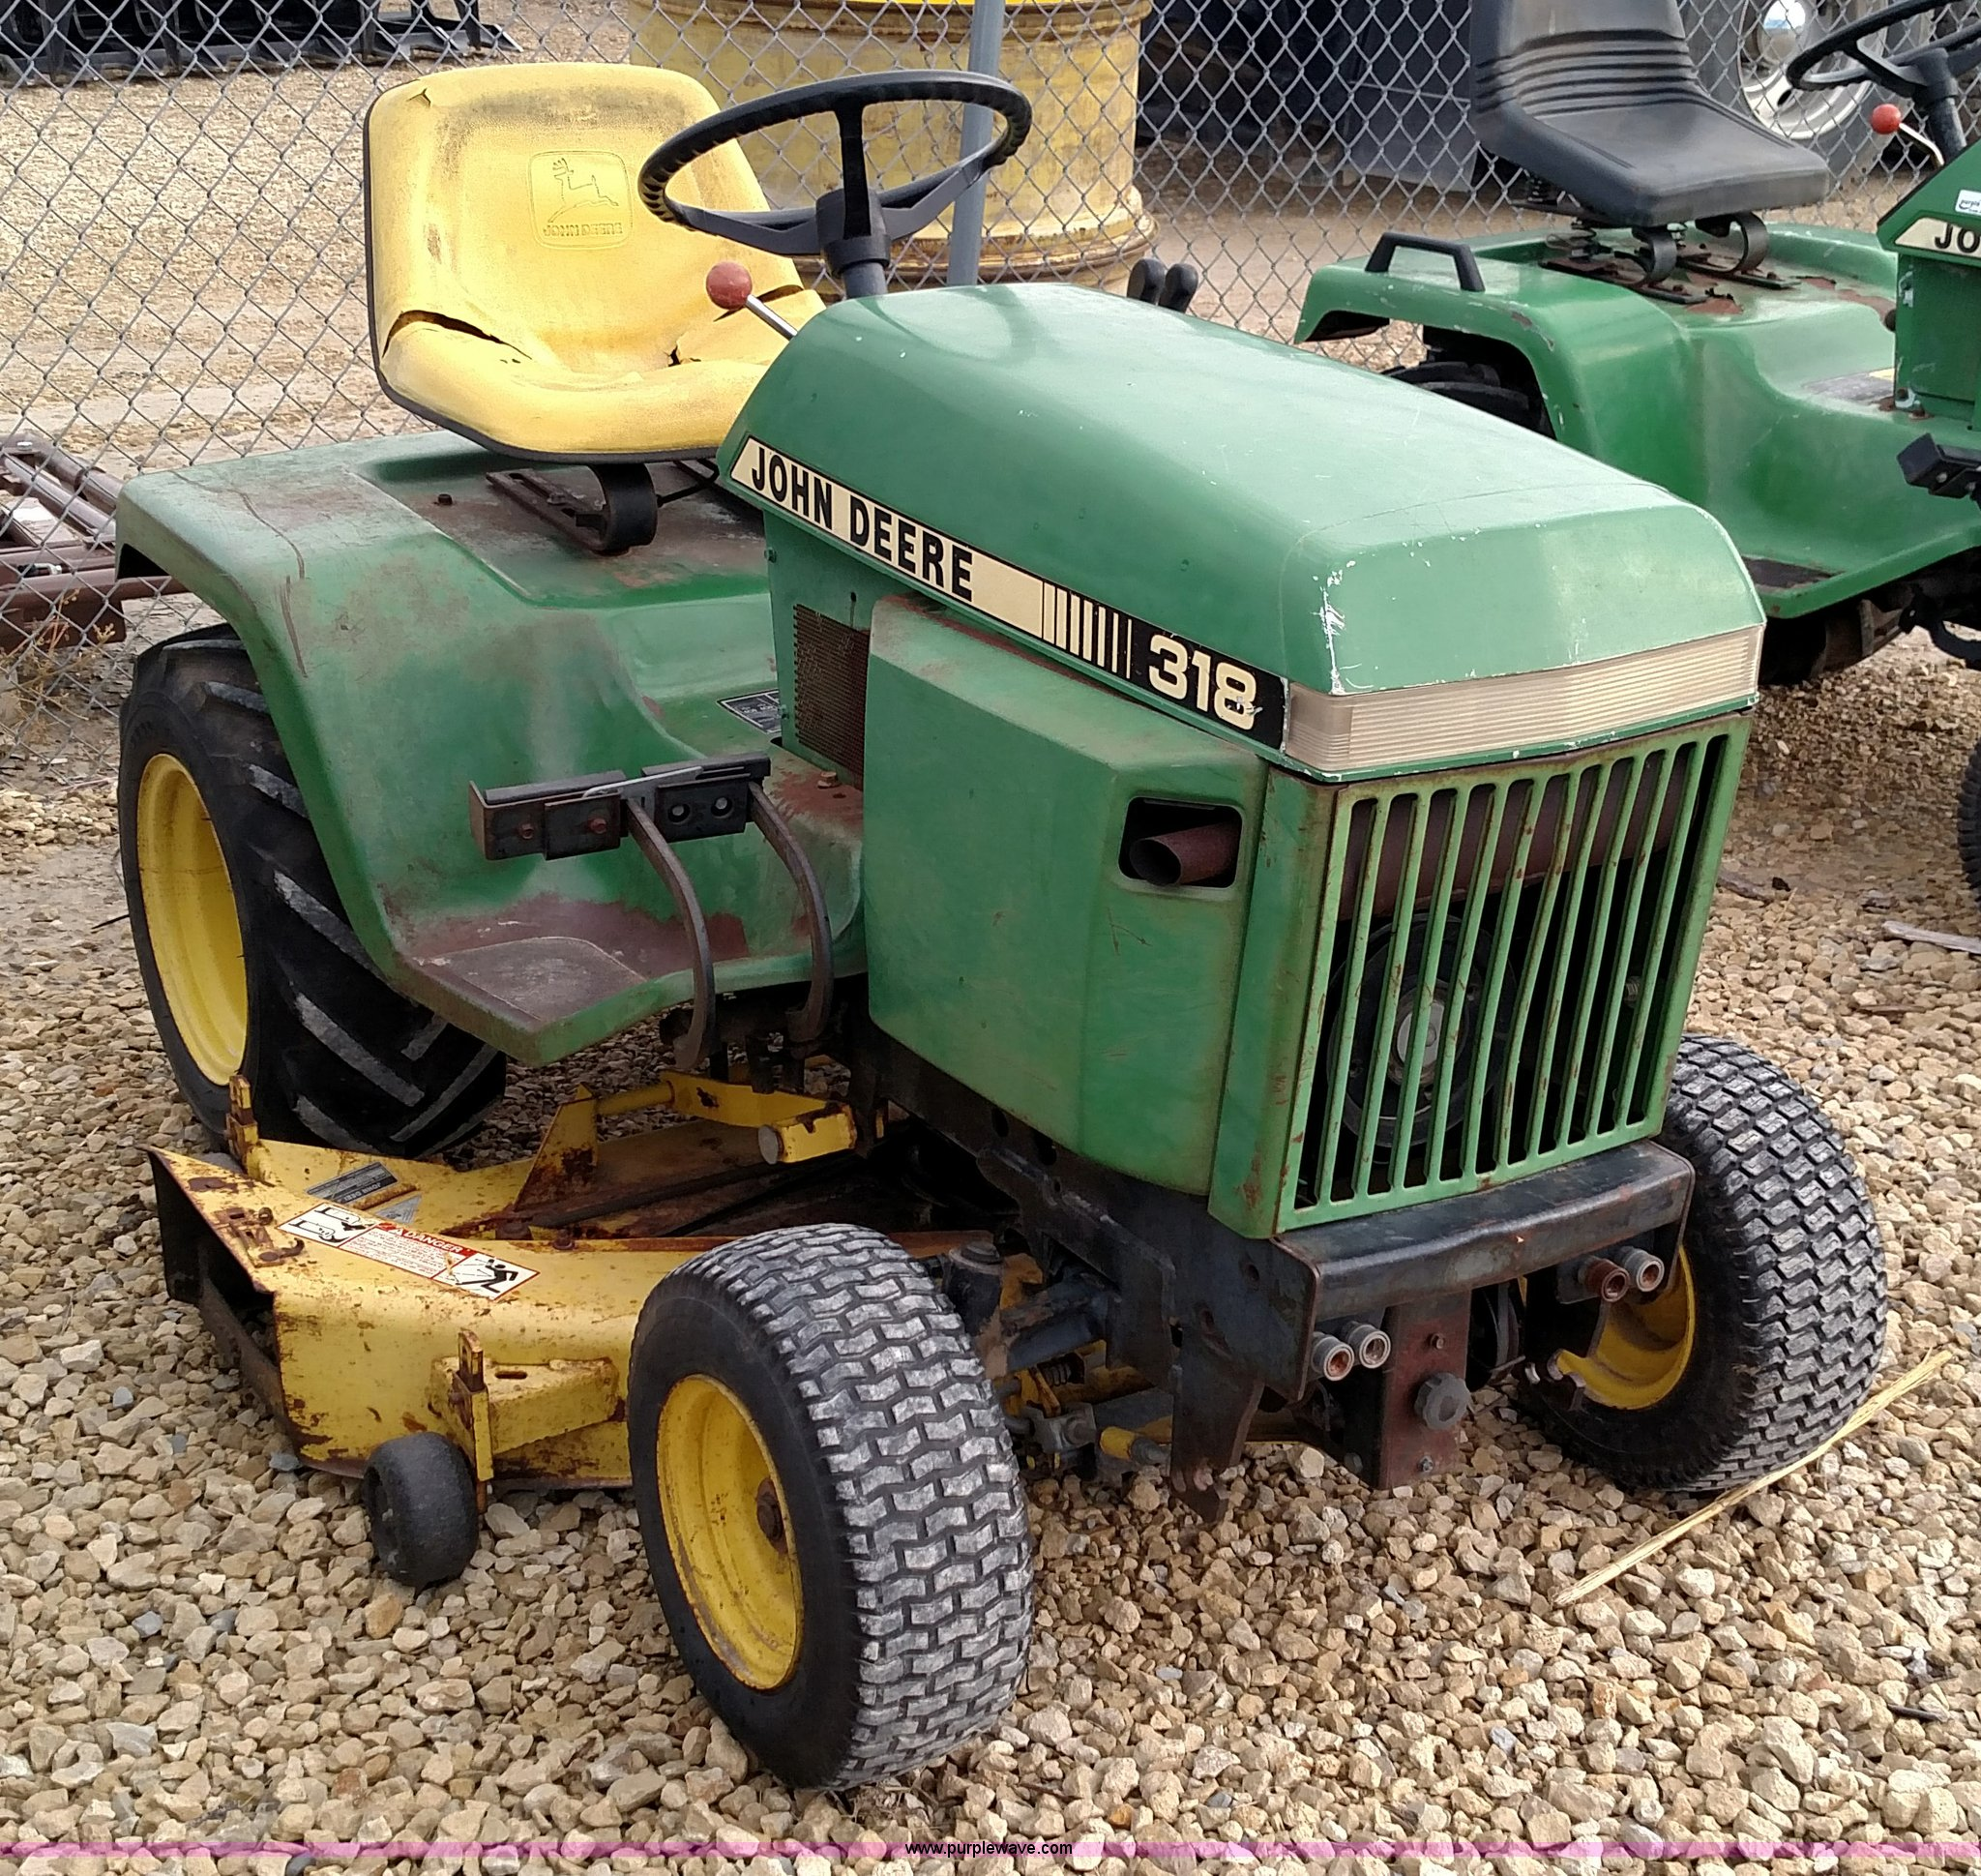 John Deere 318 lawn mower | Item BR9422 | SOLD! December 29